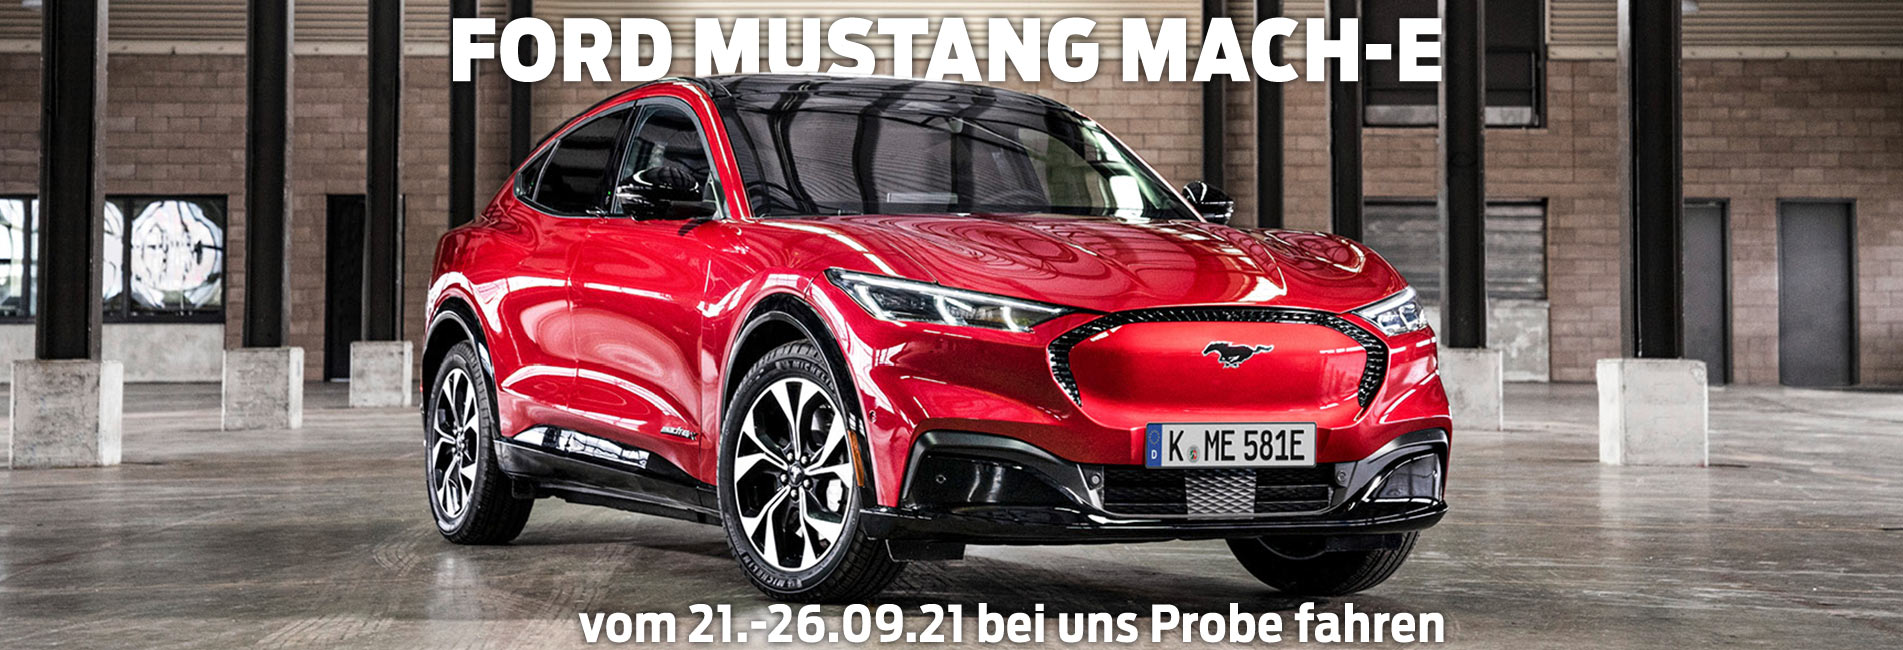 Auto_Schollenberger_Mach-E